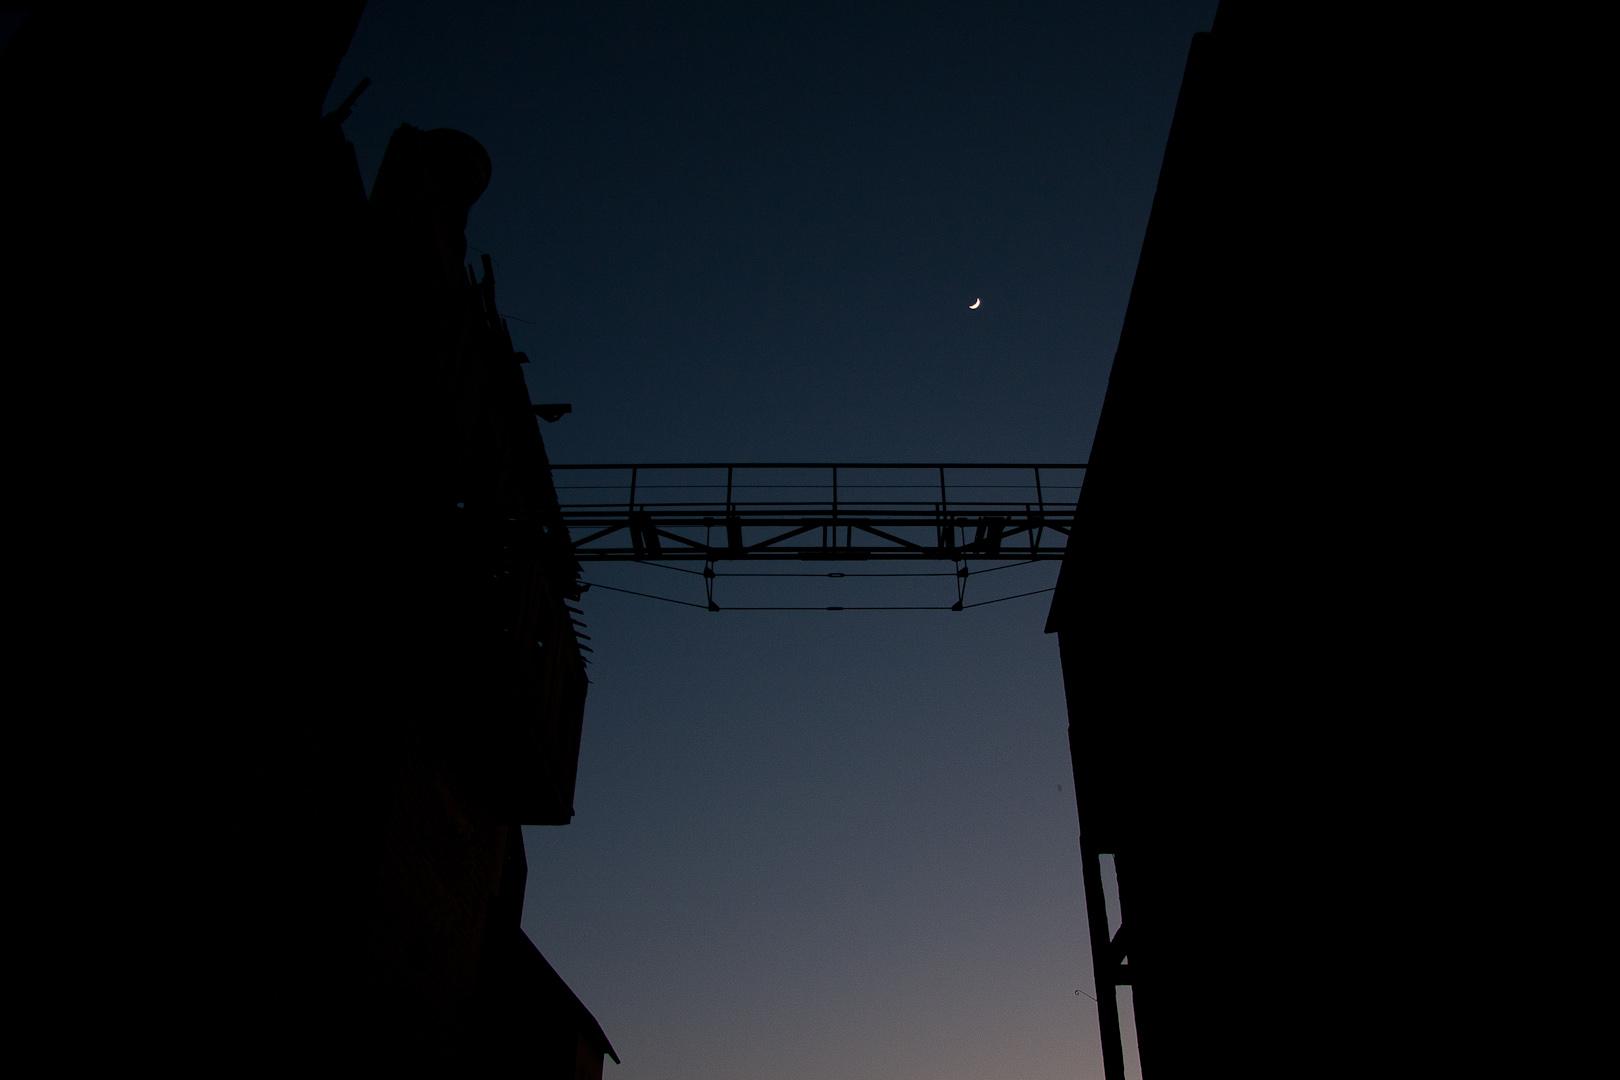 Silo by night